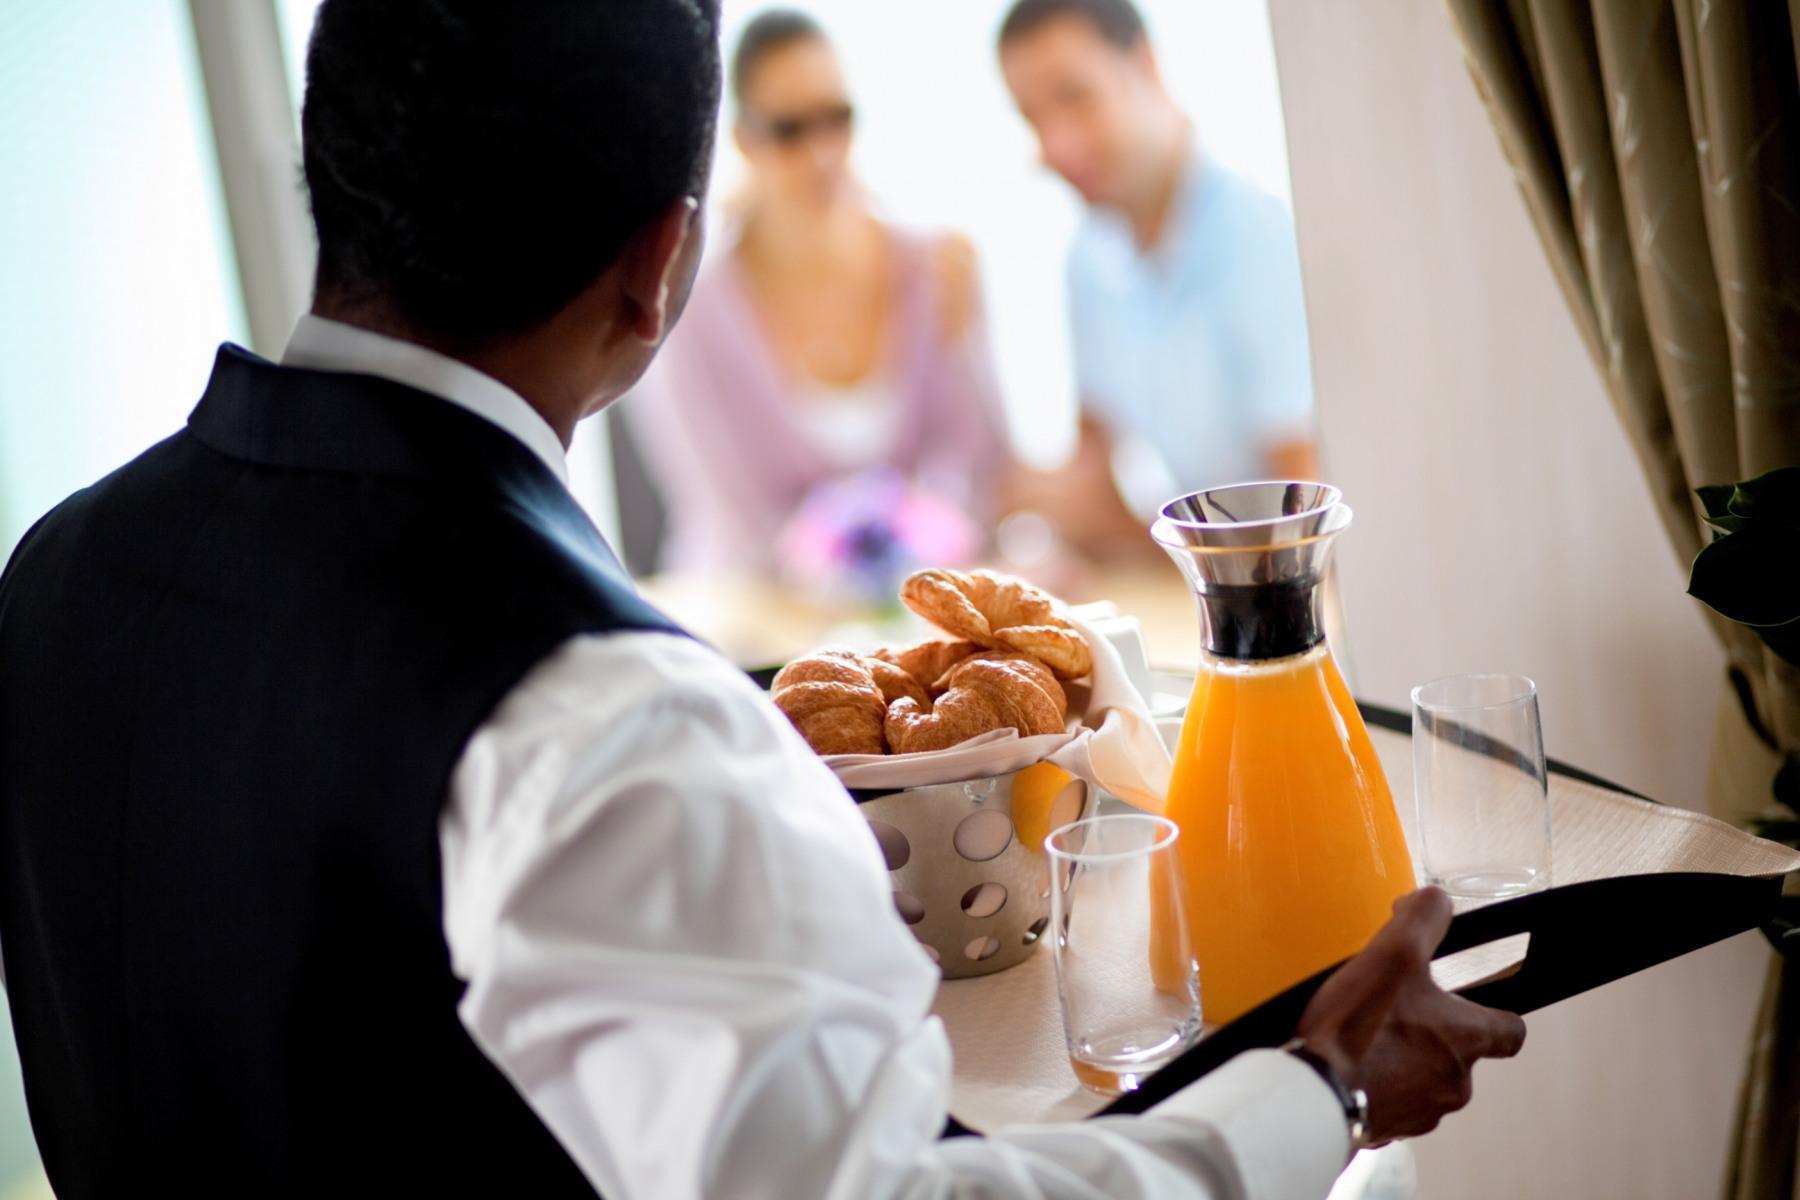 celebrity cruises celebrity silhouette room service.jpg